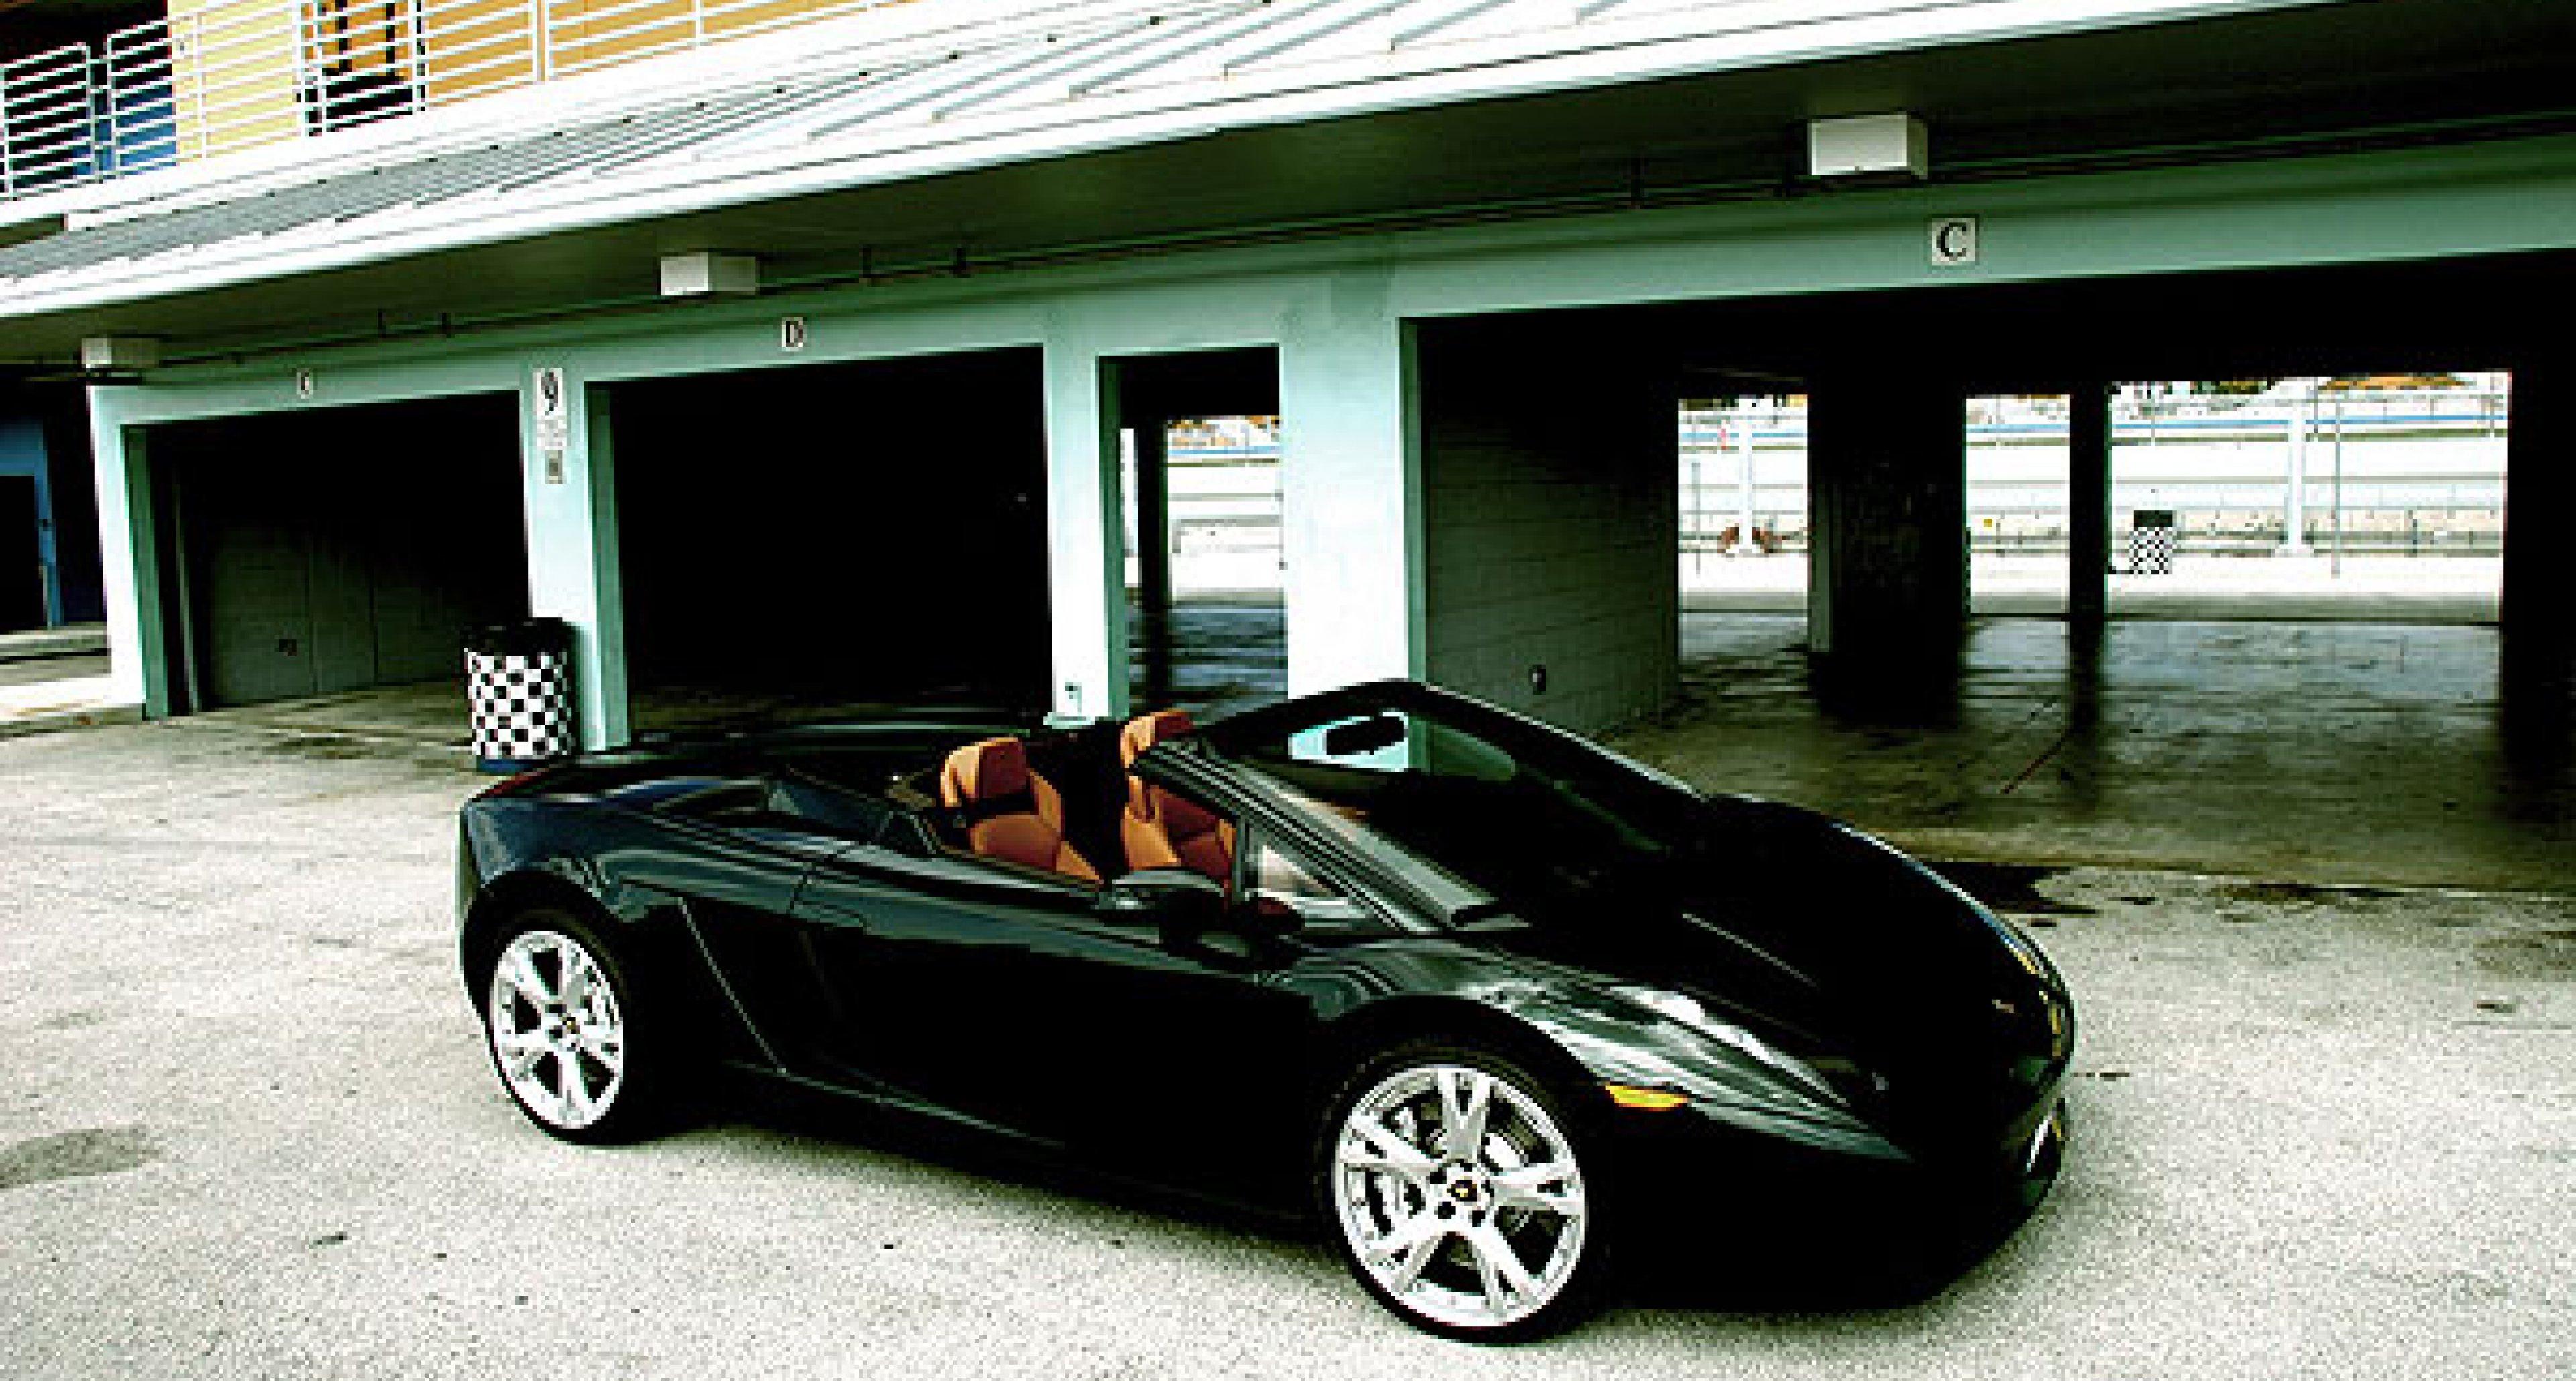 Bentley, Bugatti & Lamborghini: The Best of Three Worlds